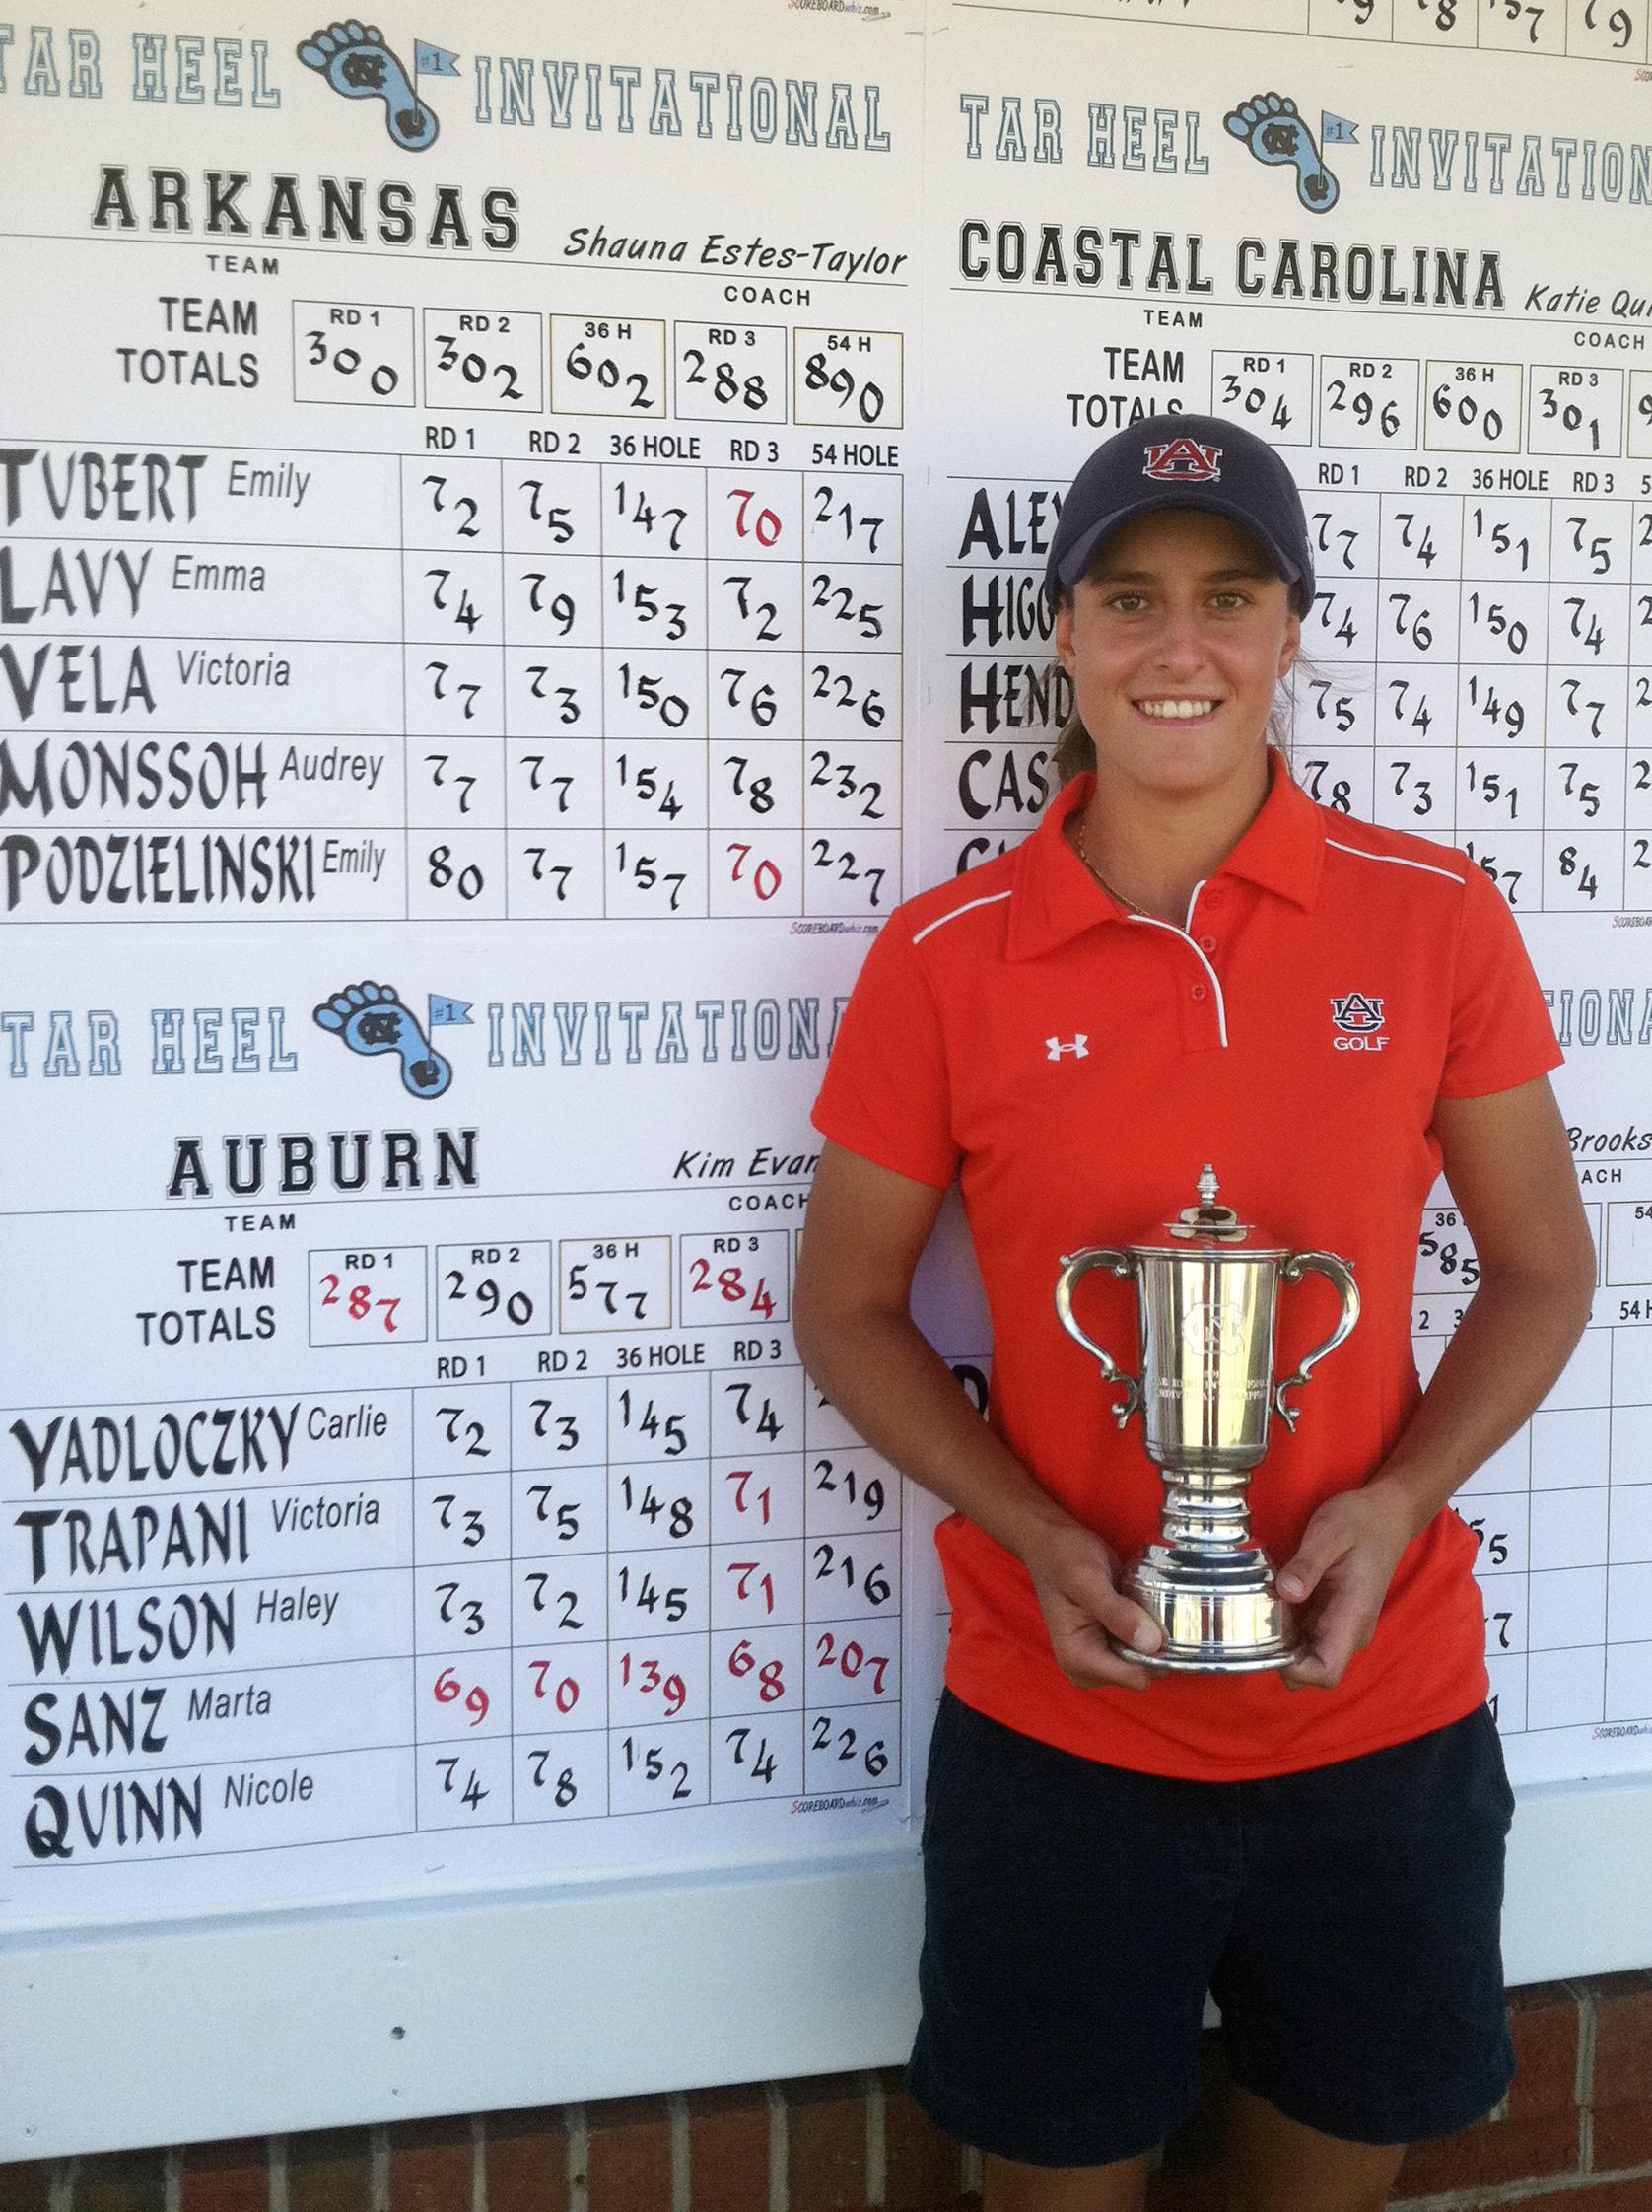 Auburn's Marta Sanz